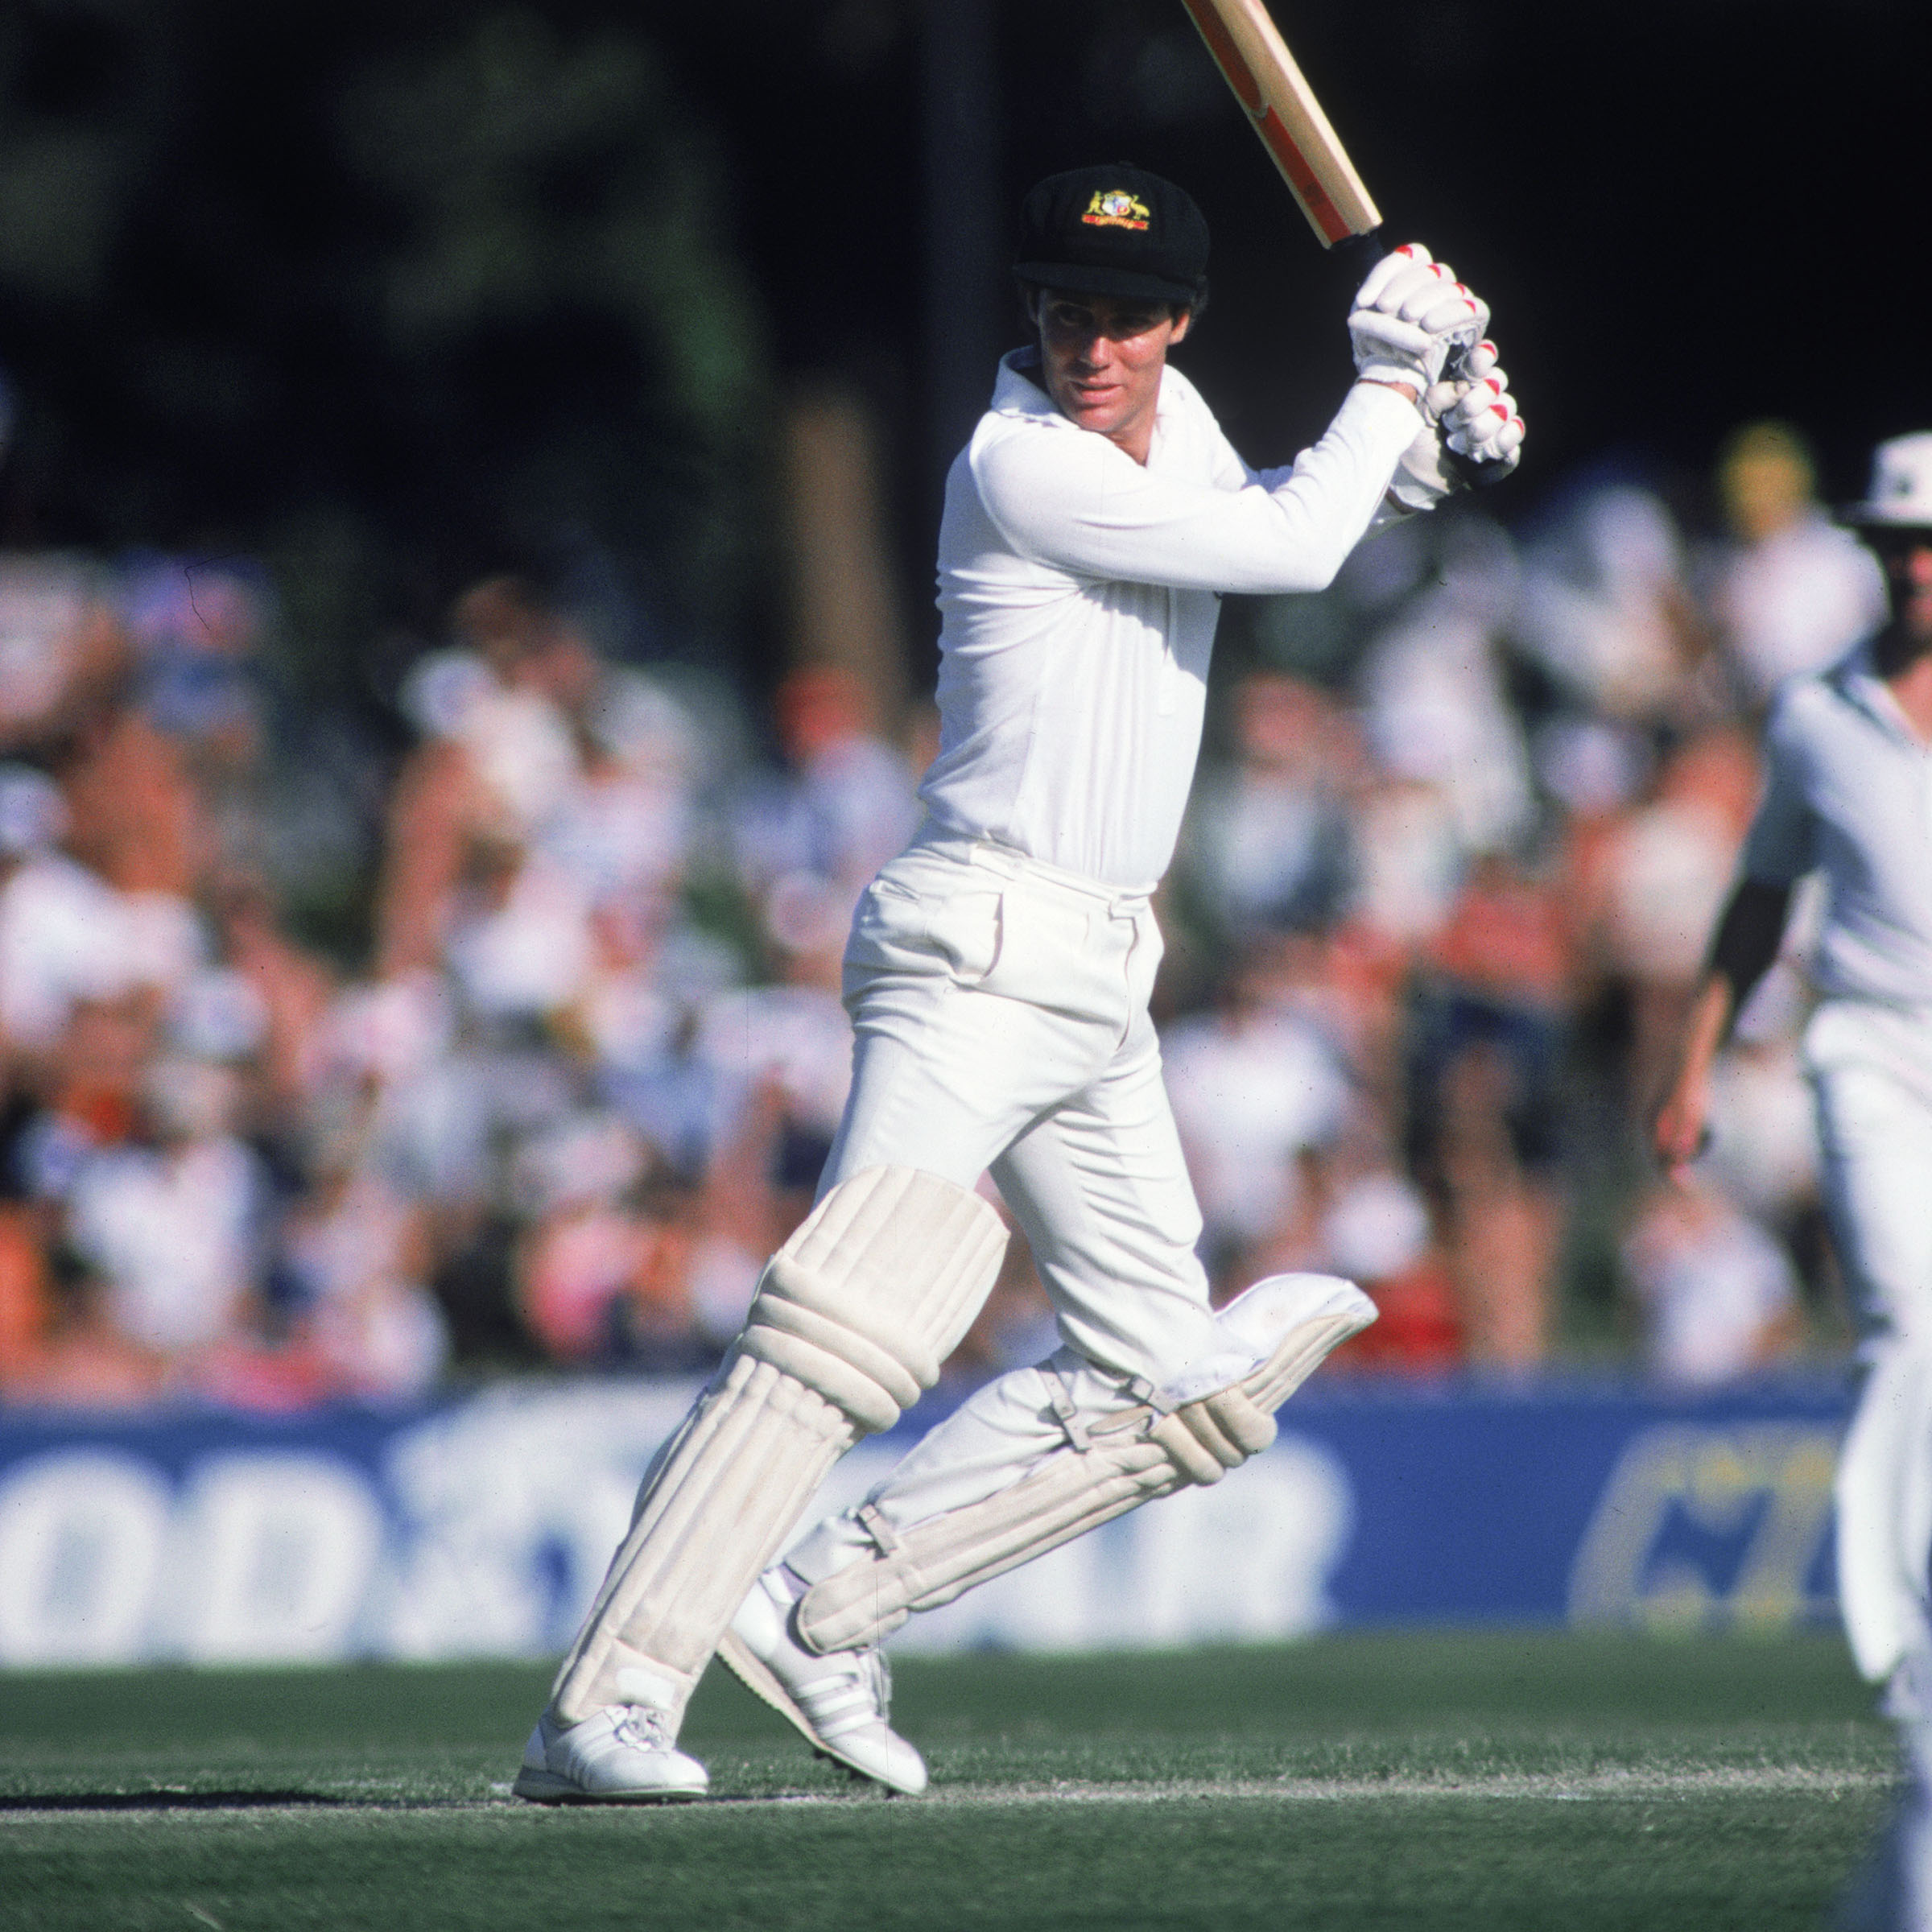 Chappell is one of Australia's greatest ever batsmen // Getty